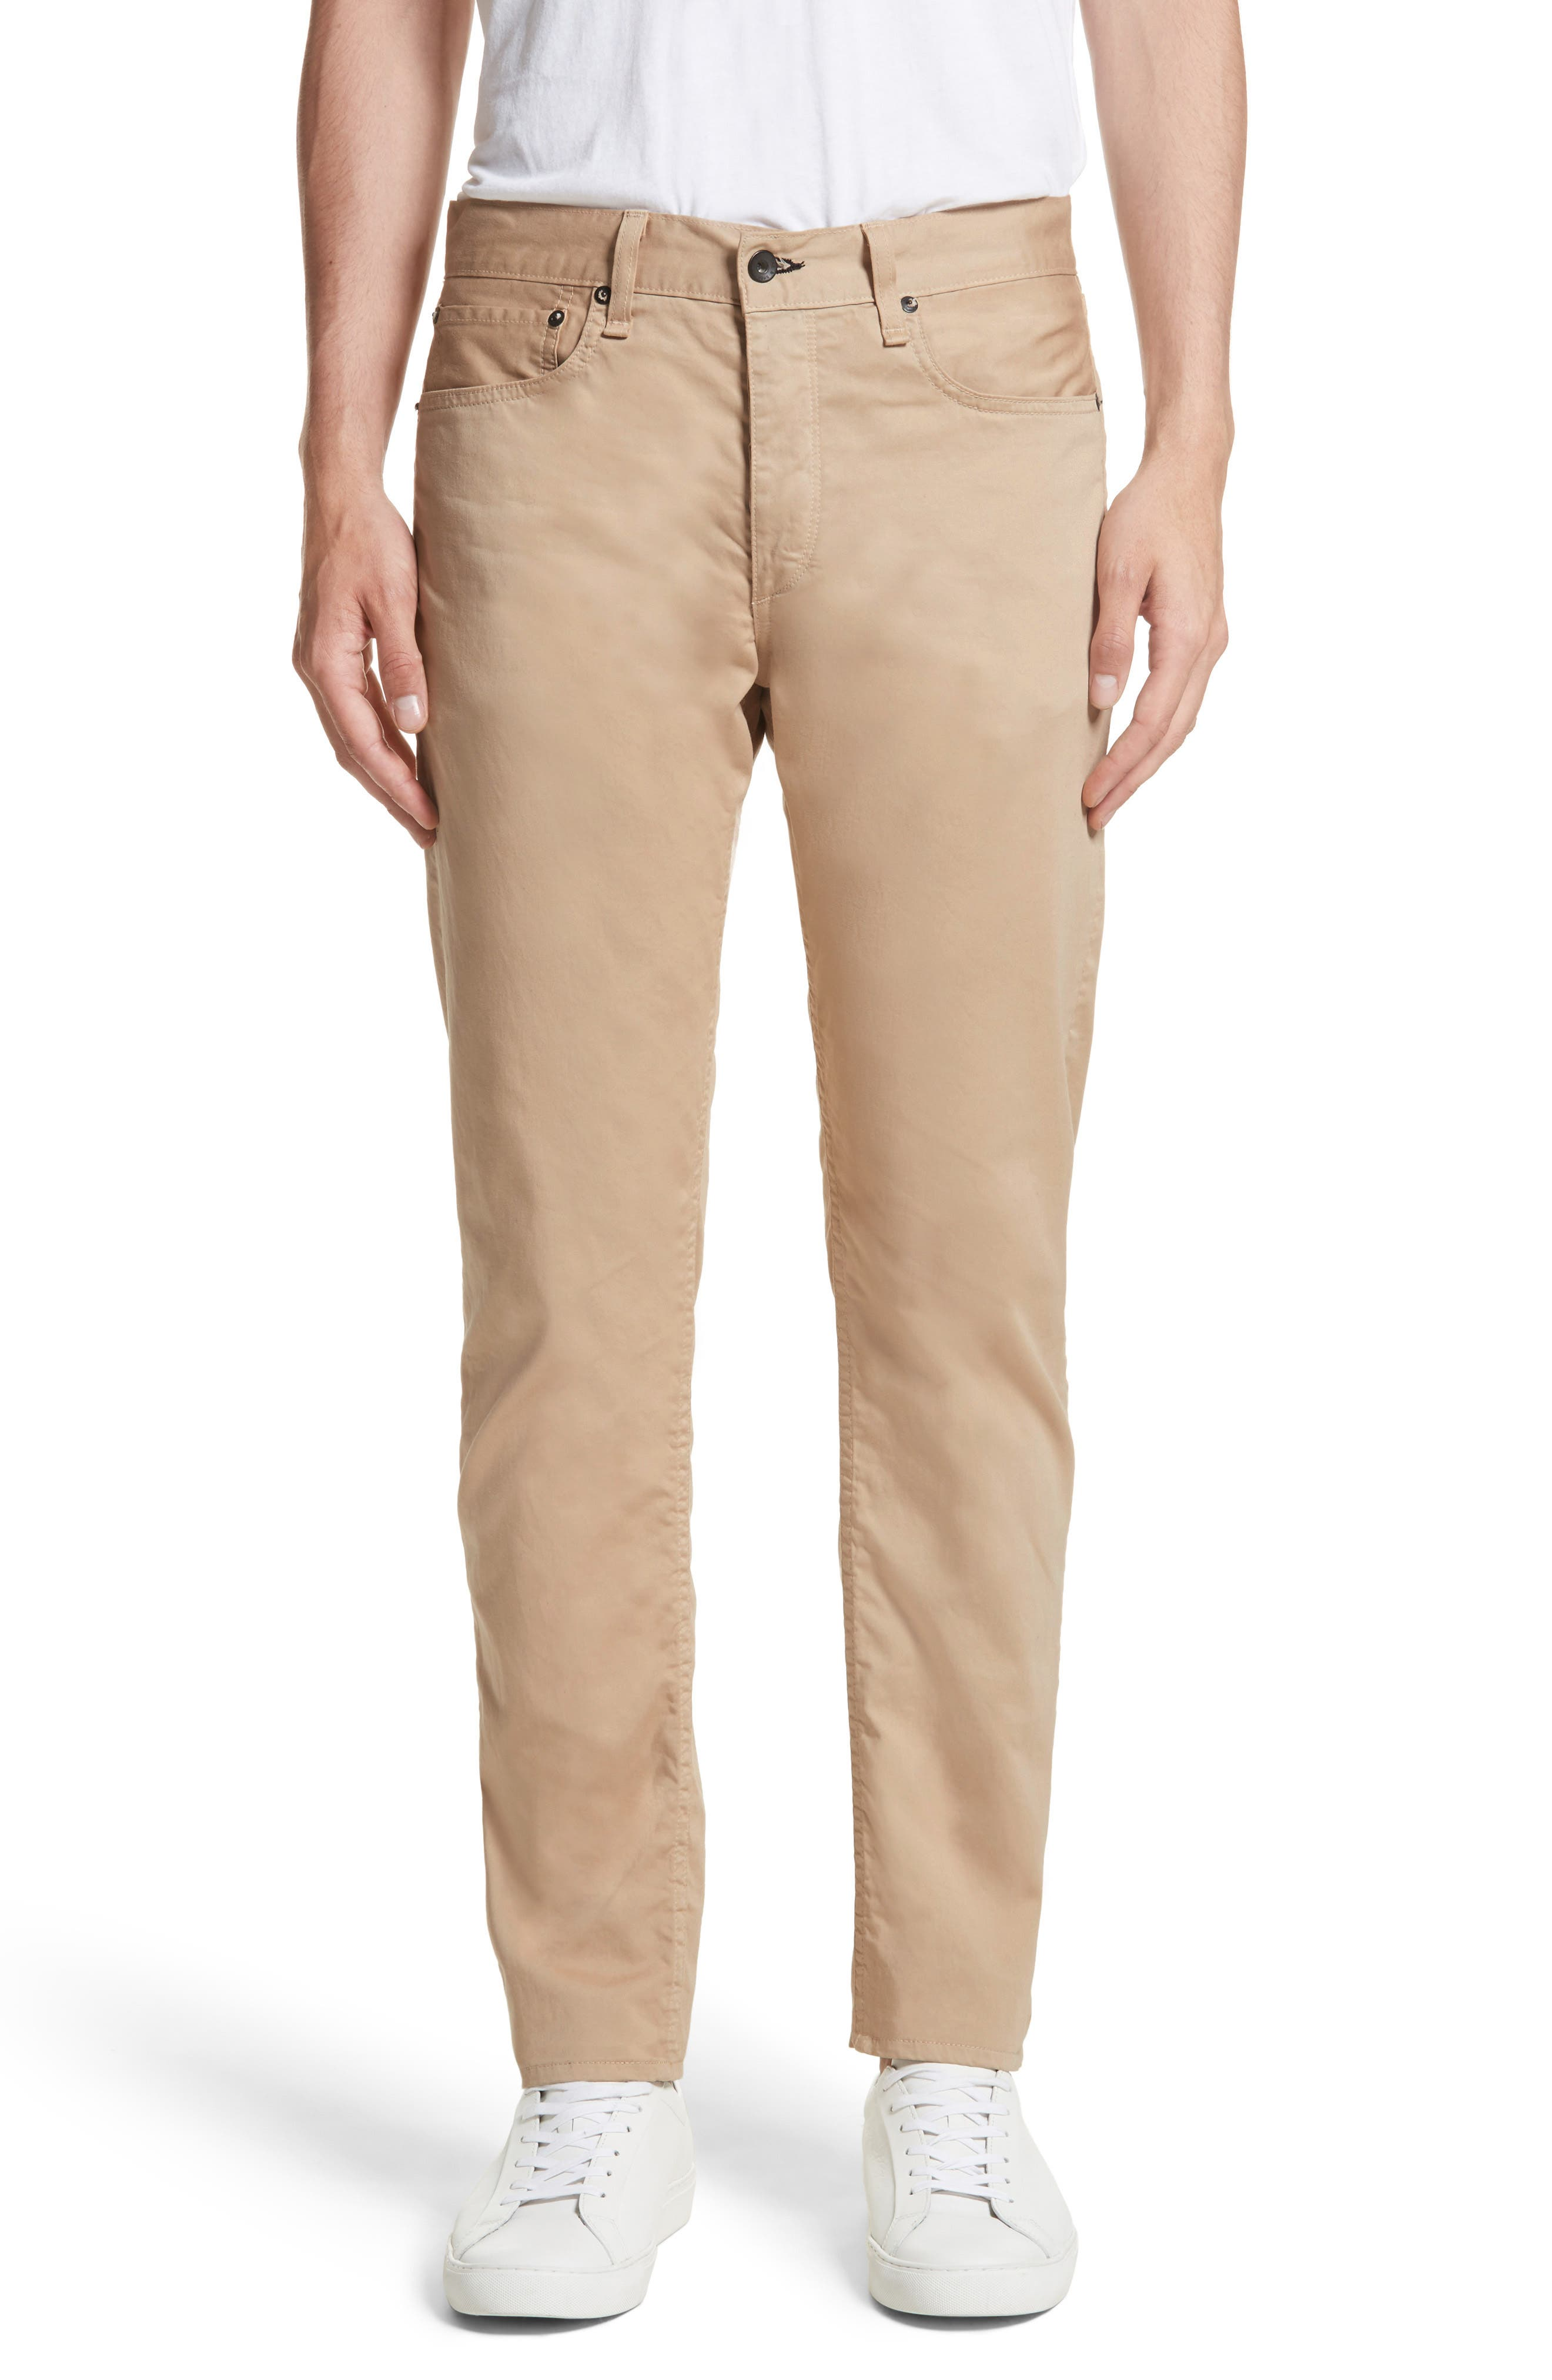 Fit 2 Five-Pocket Twill Pants,                             Main thumbnail 1, color,                             250